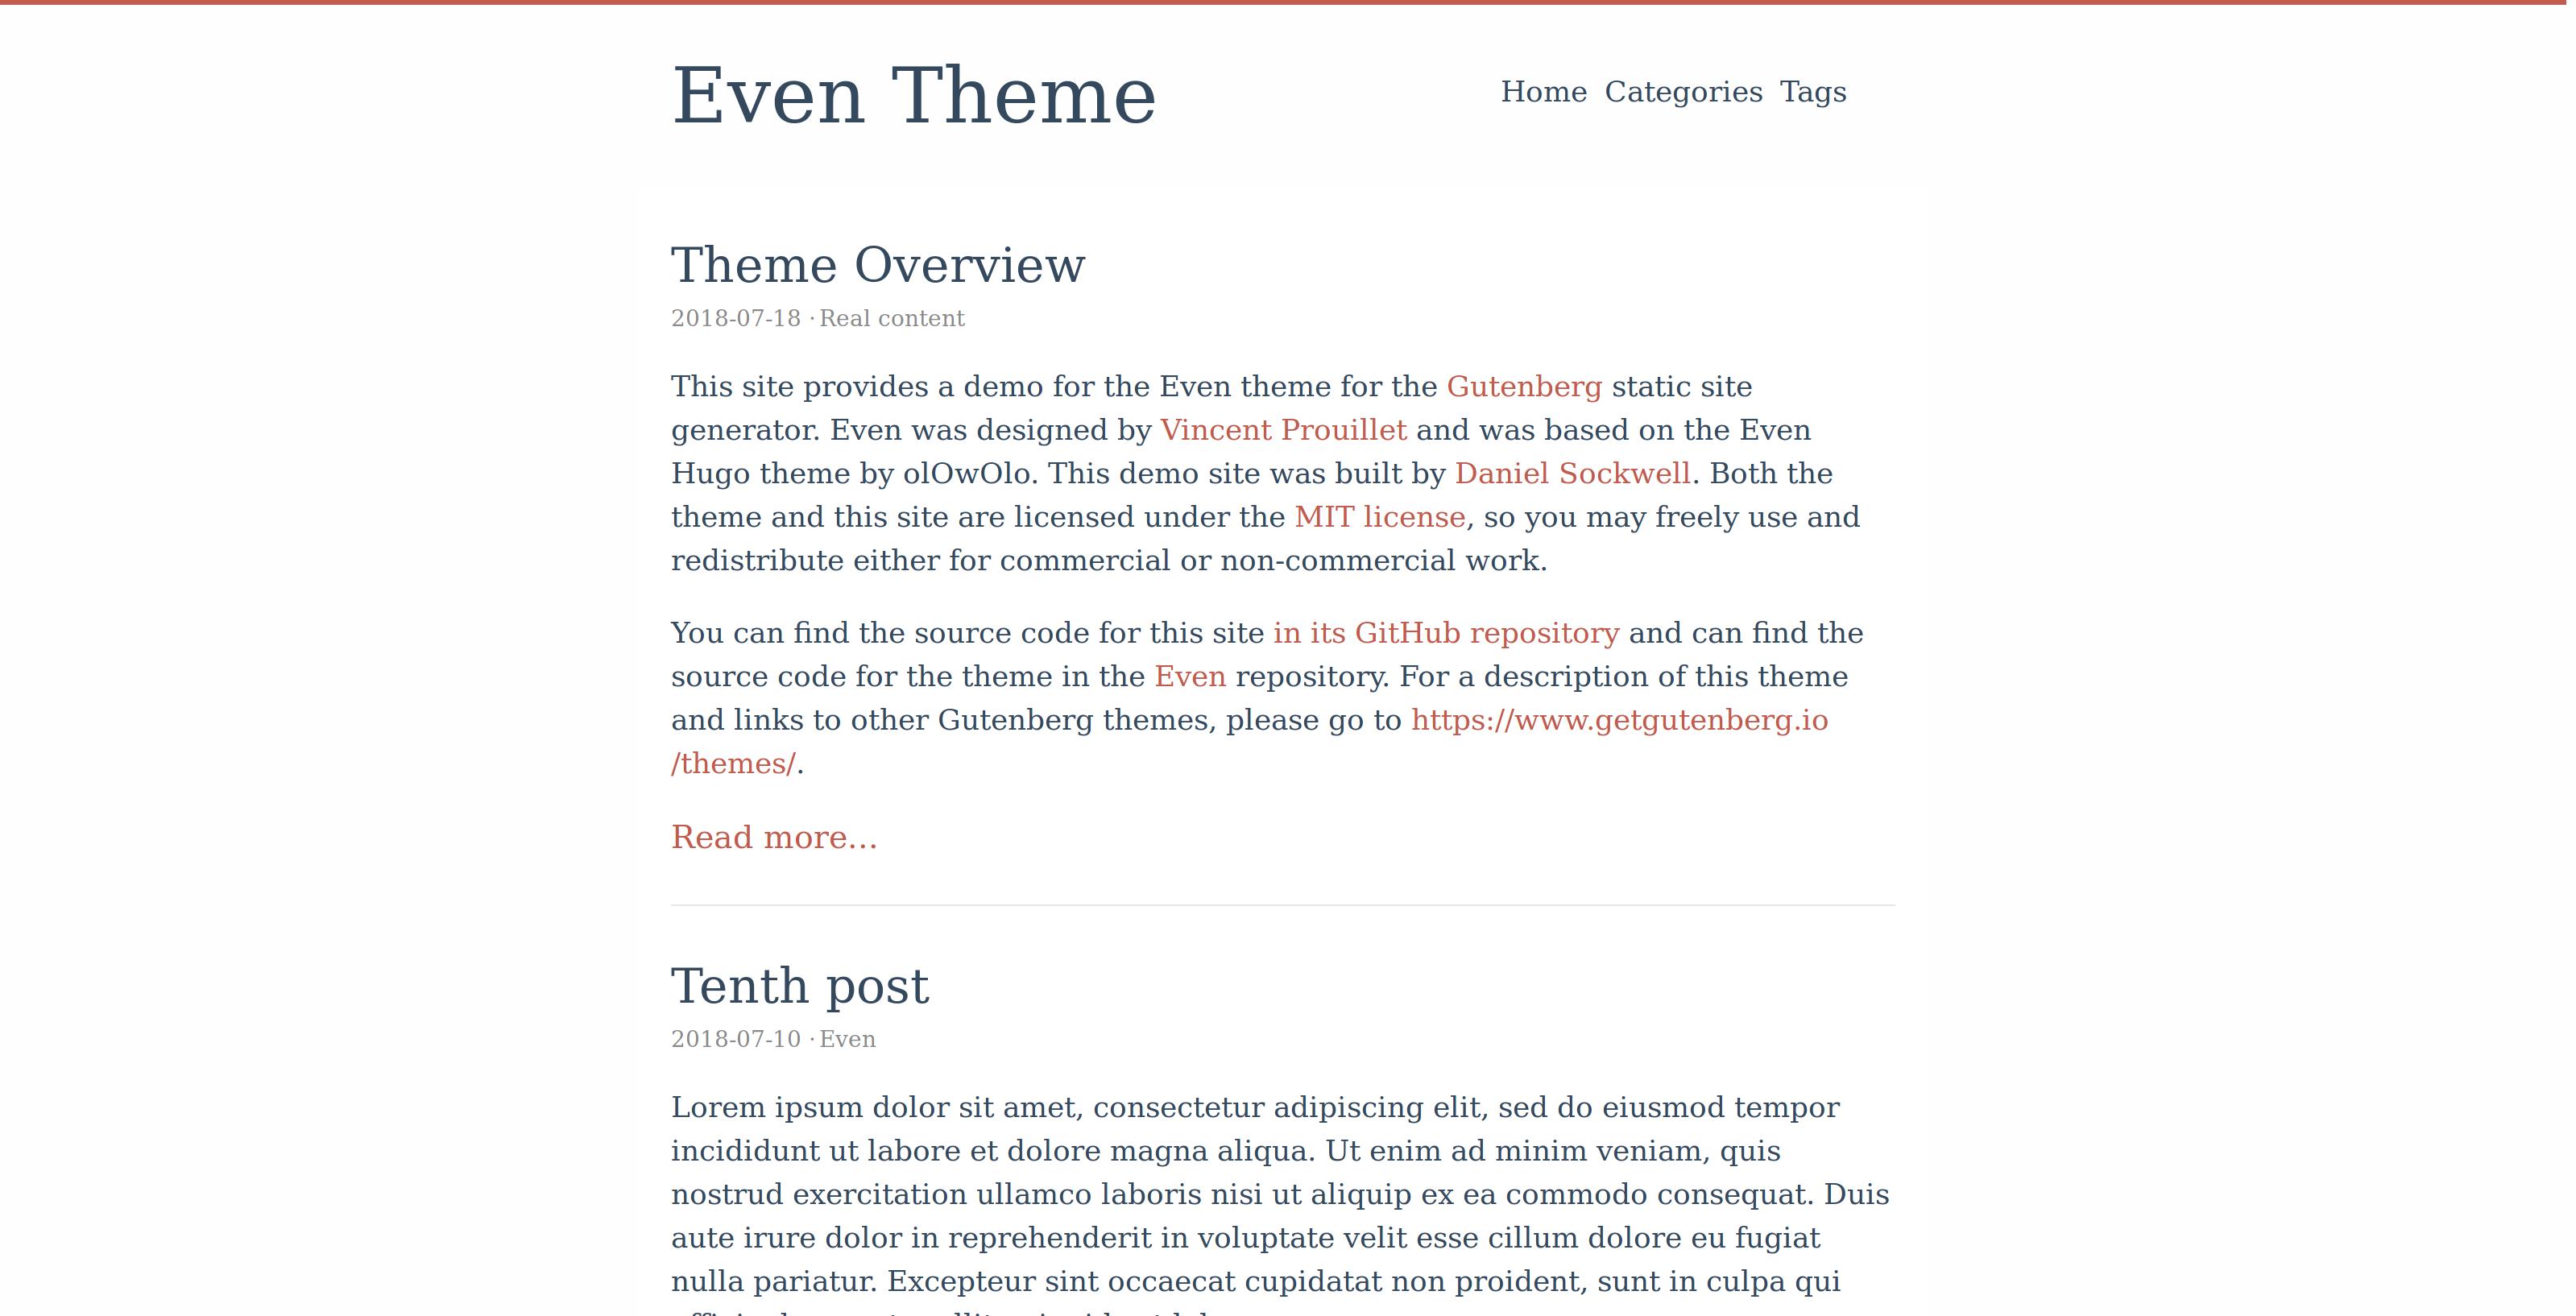 Screenshot of Even theme